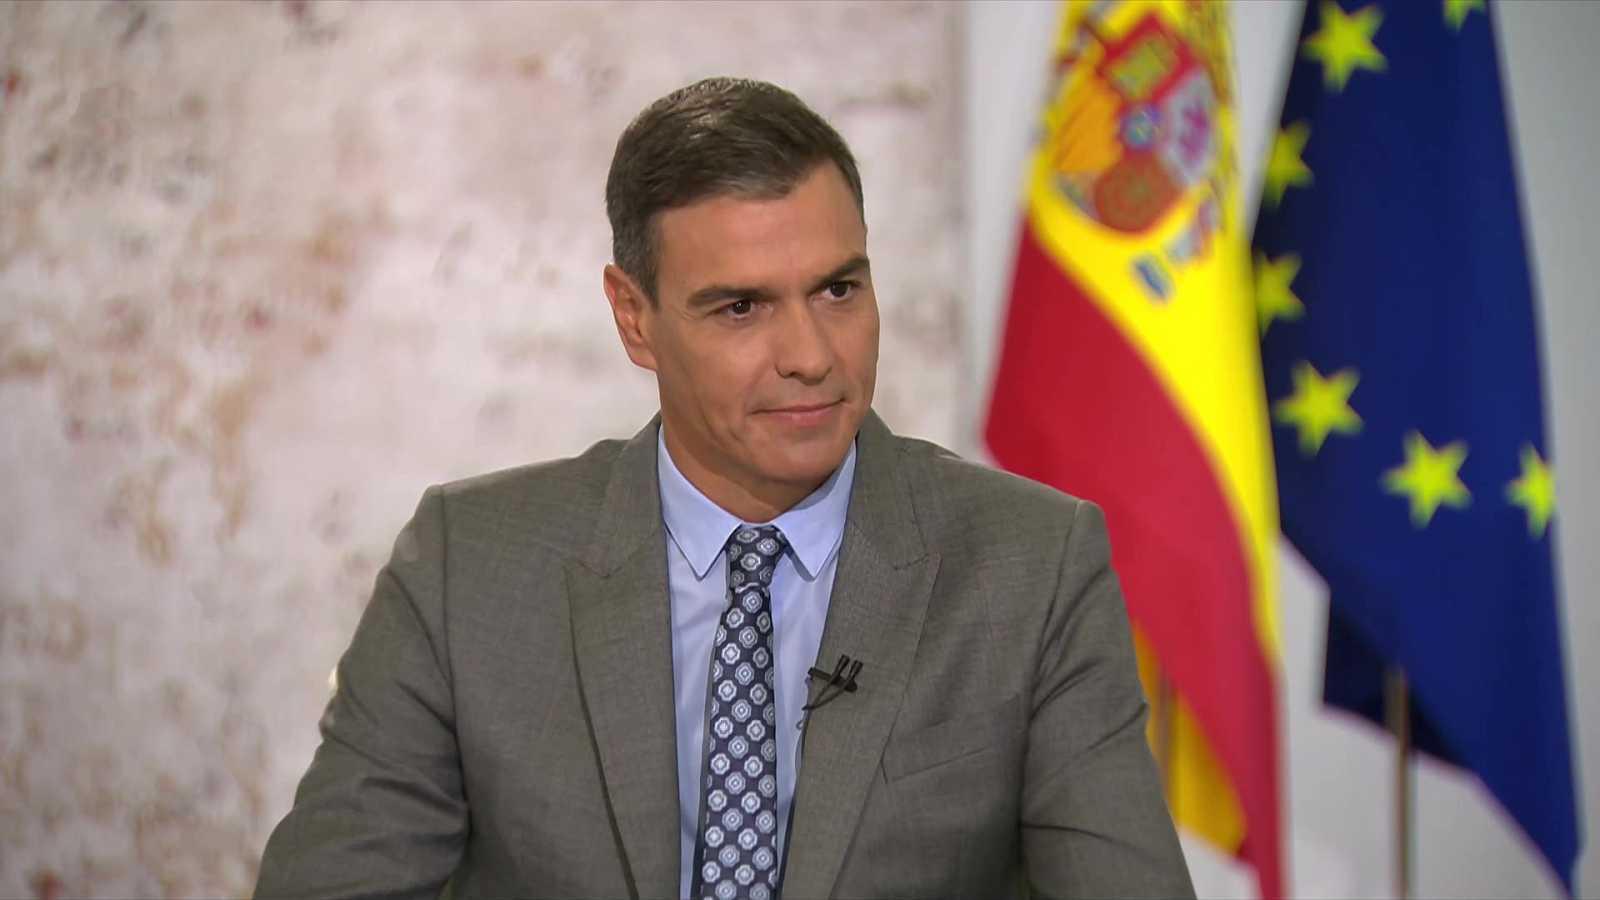 Telediario - Entrevista a Pedro Sánchez  - 13/09/21 - ver ahora